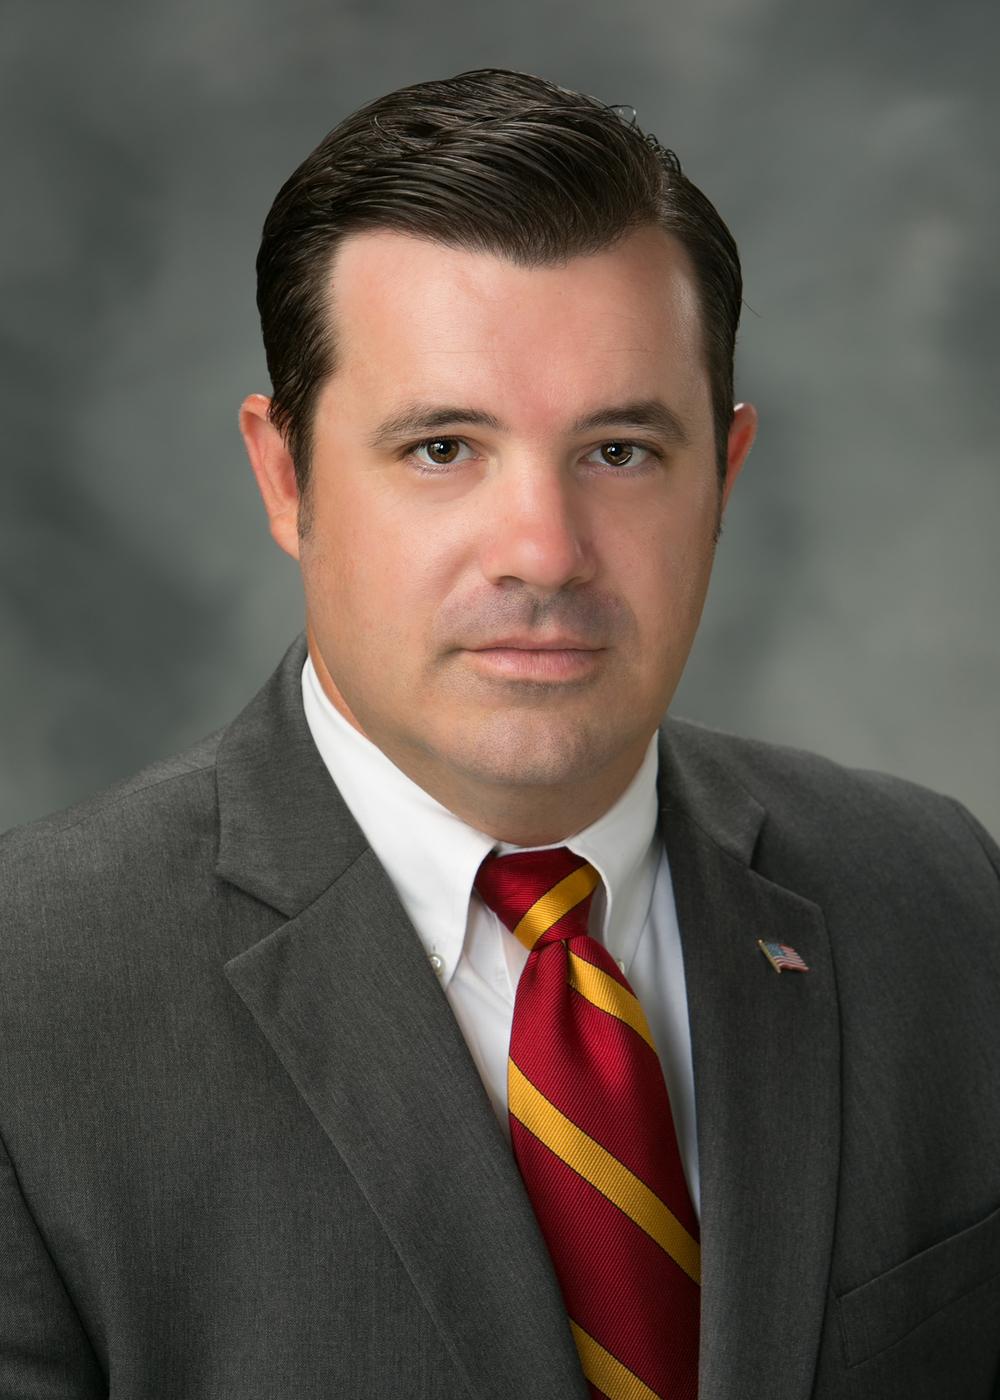 Mike MacGillivray, SMMA Insurance